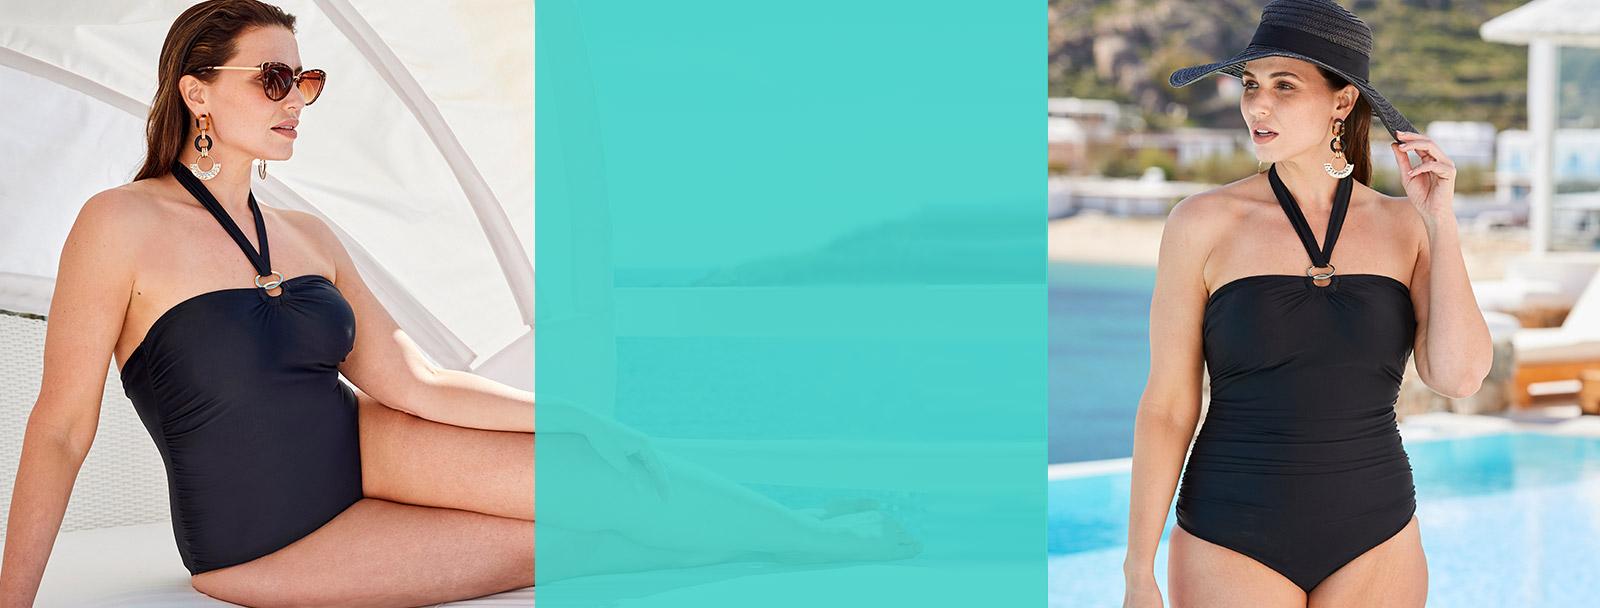 aeab689de0 Plus Size Clothing: Dresses, Lingerie & Swimwear | Marisota